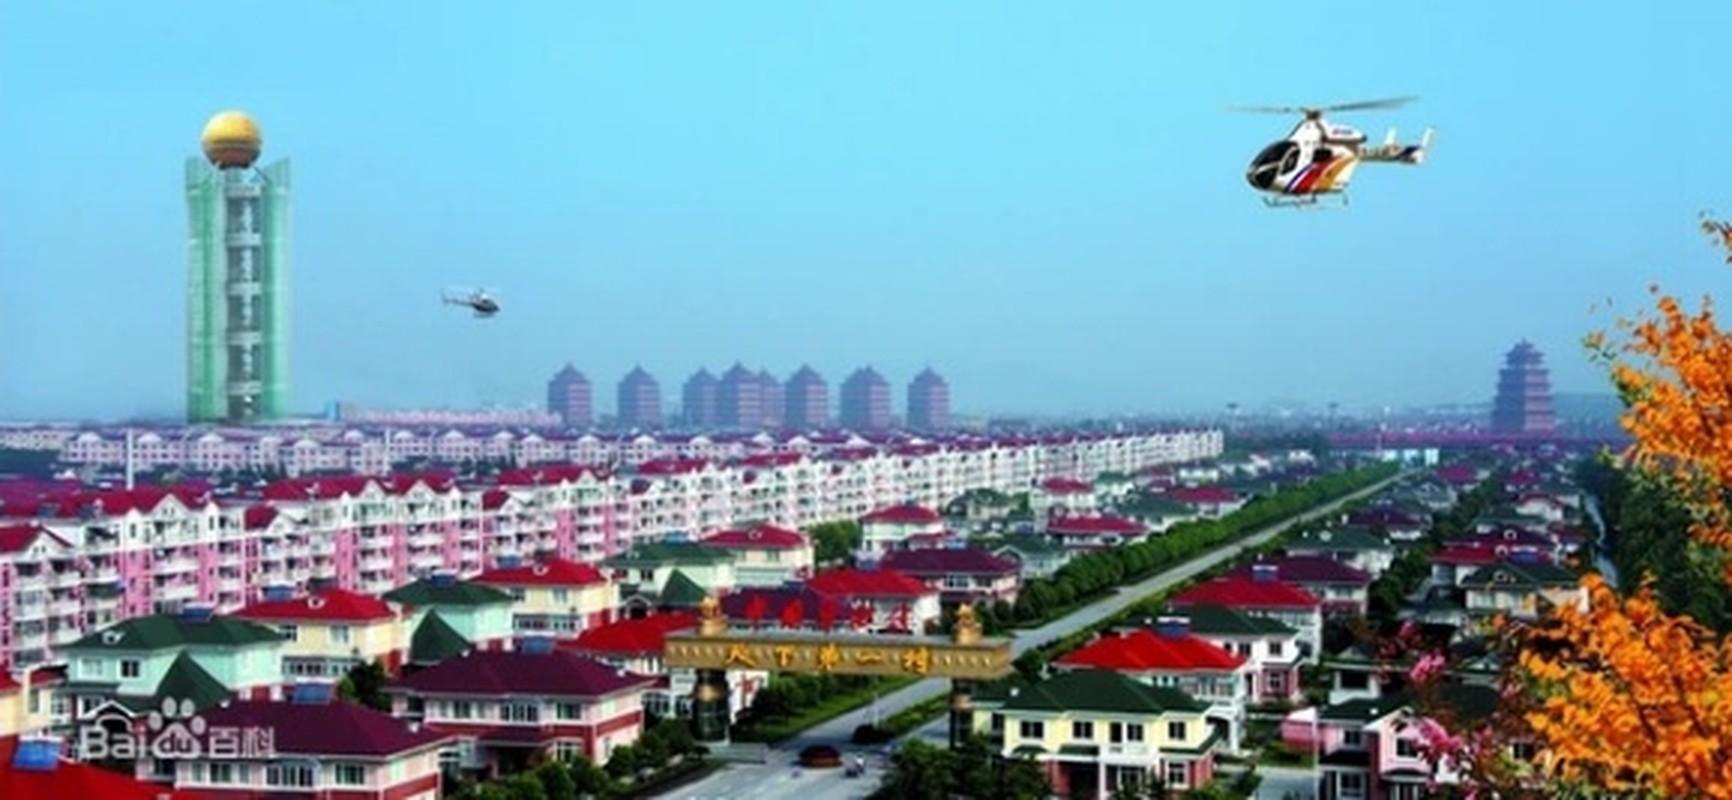 Bi an trong ngoi lang giau co nhat Trung Quoc-Hinh-3